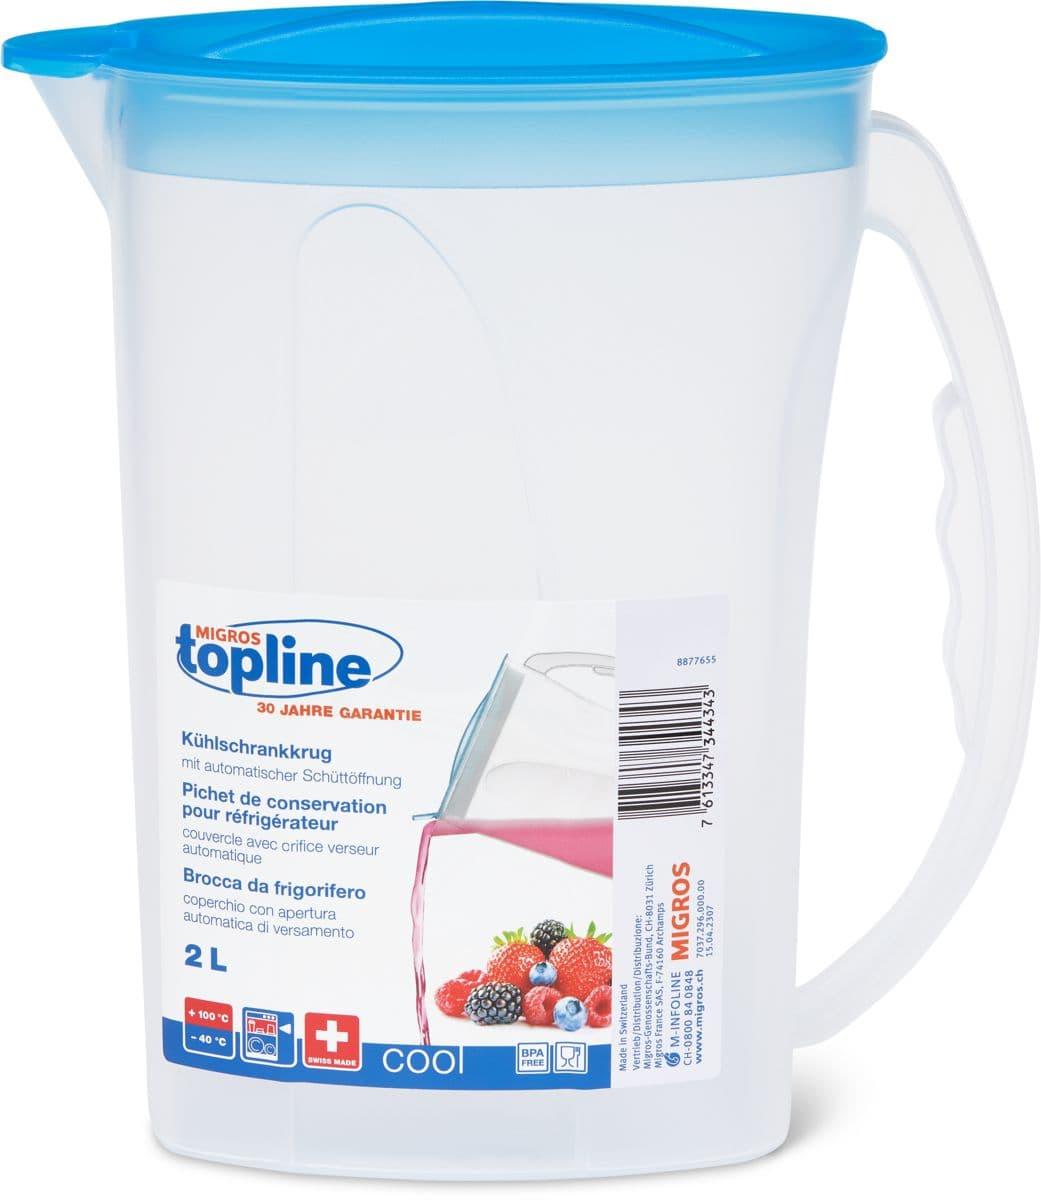 M-Topline Kühlschrankkrug 2.0L